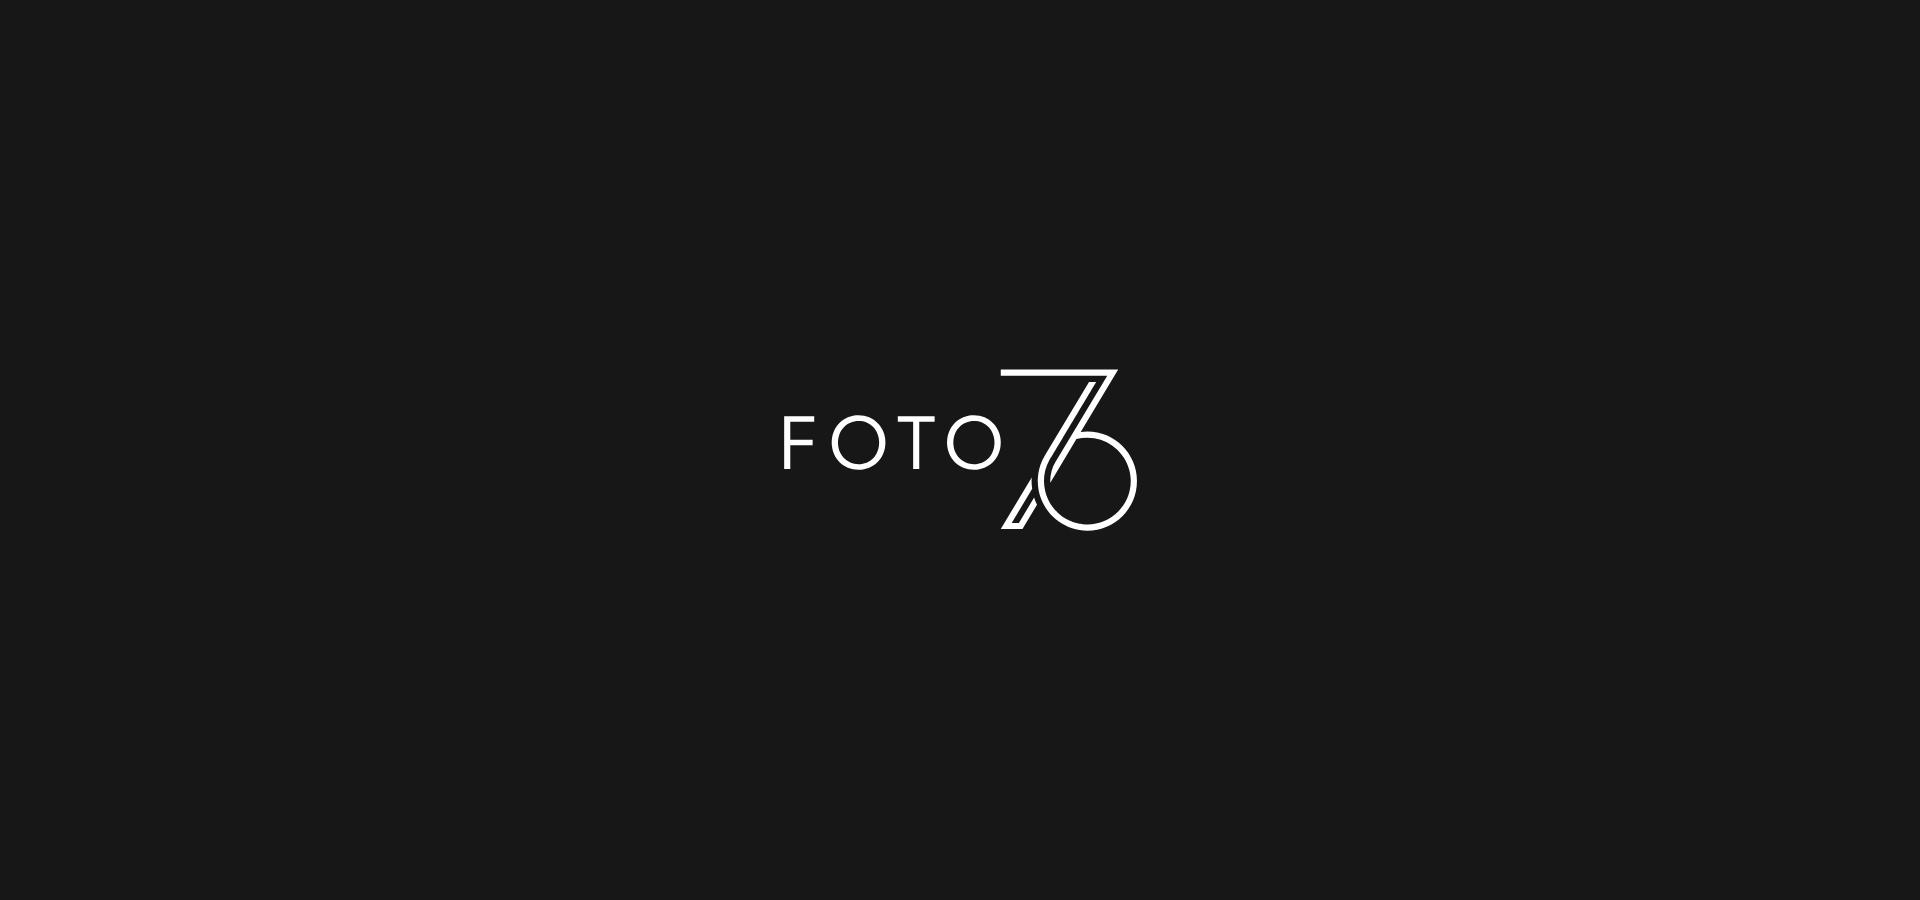 Dominik-Pacholczyk-Logo-Design-Collection-11